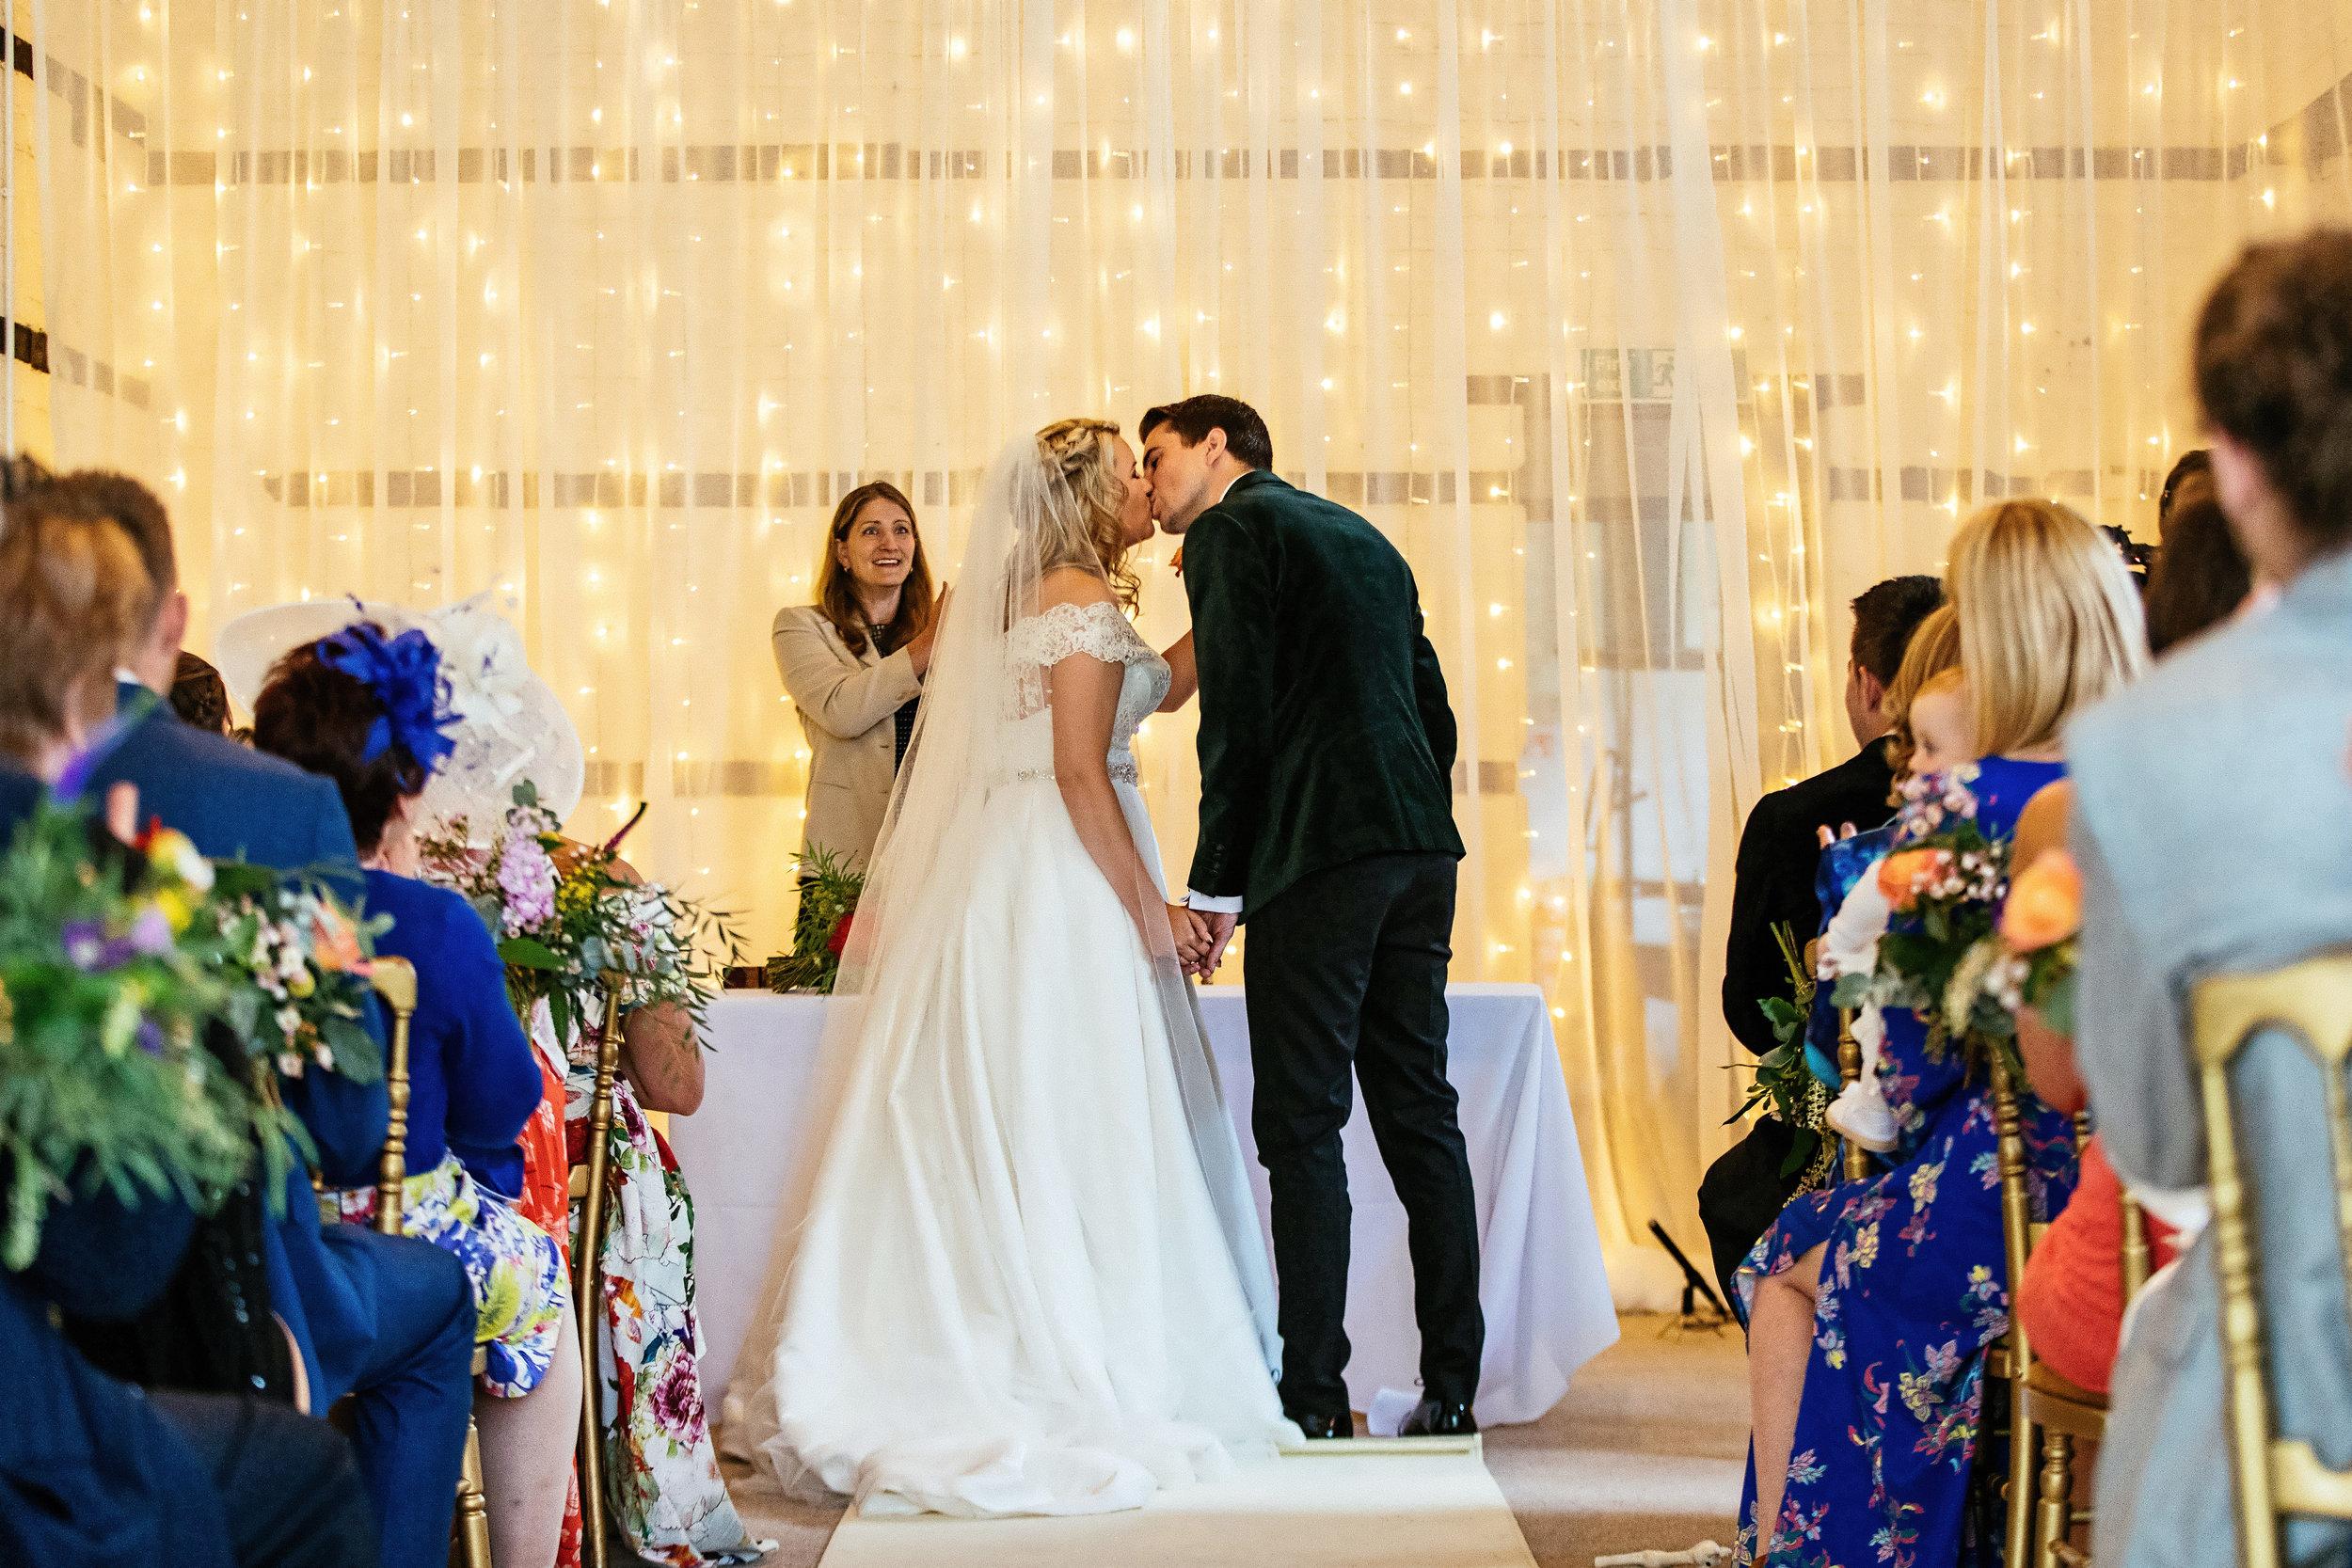 Tamara-and-Richard-Wedding-Highlights-27.jpg